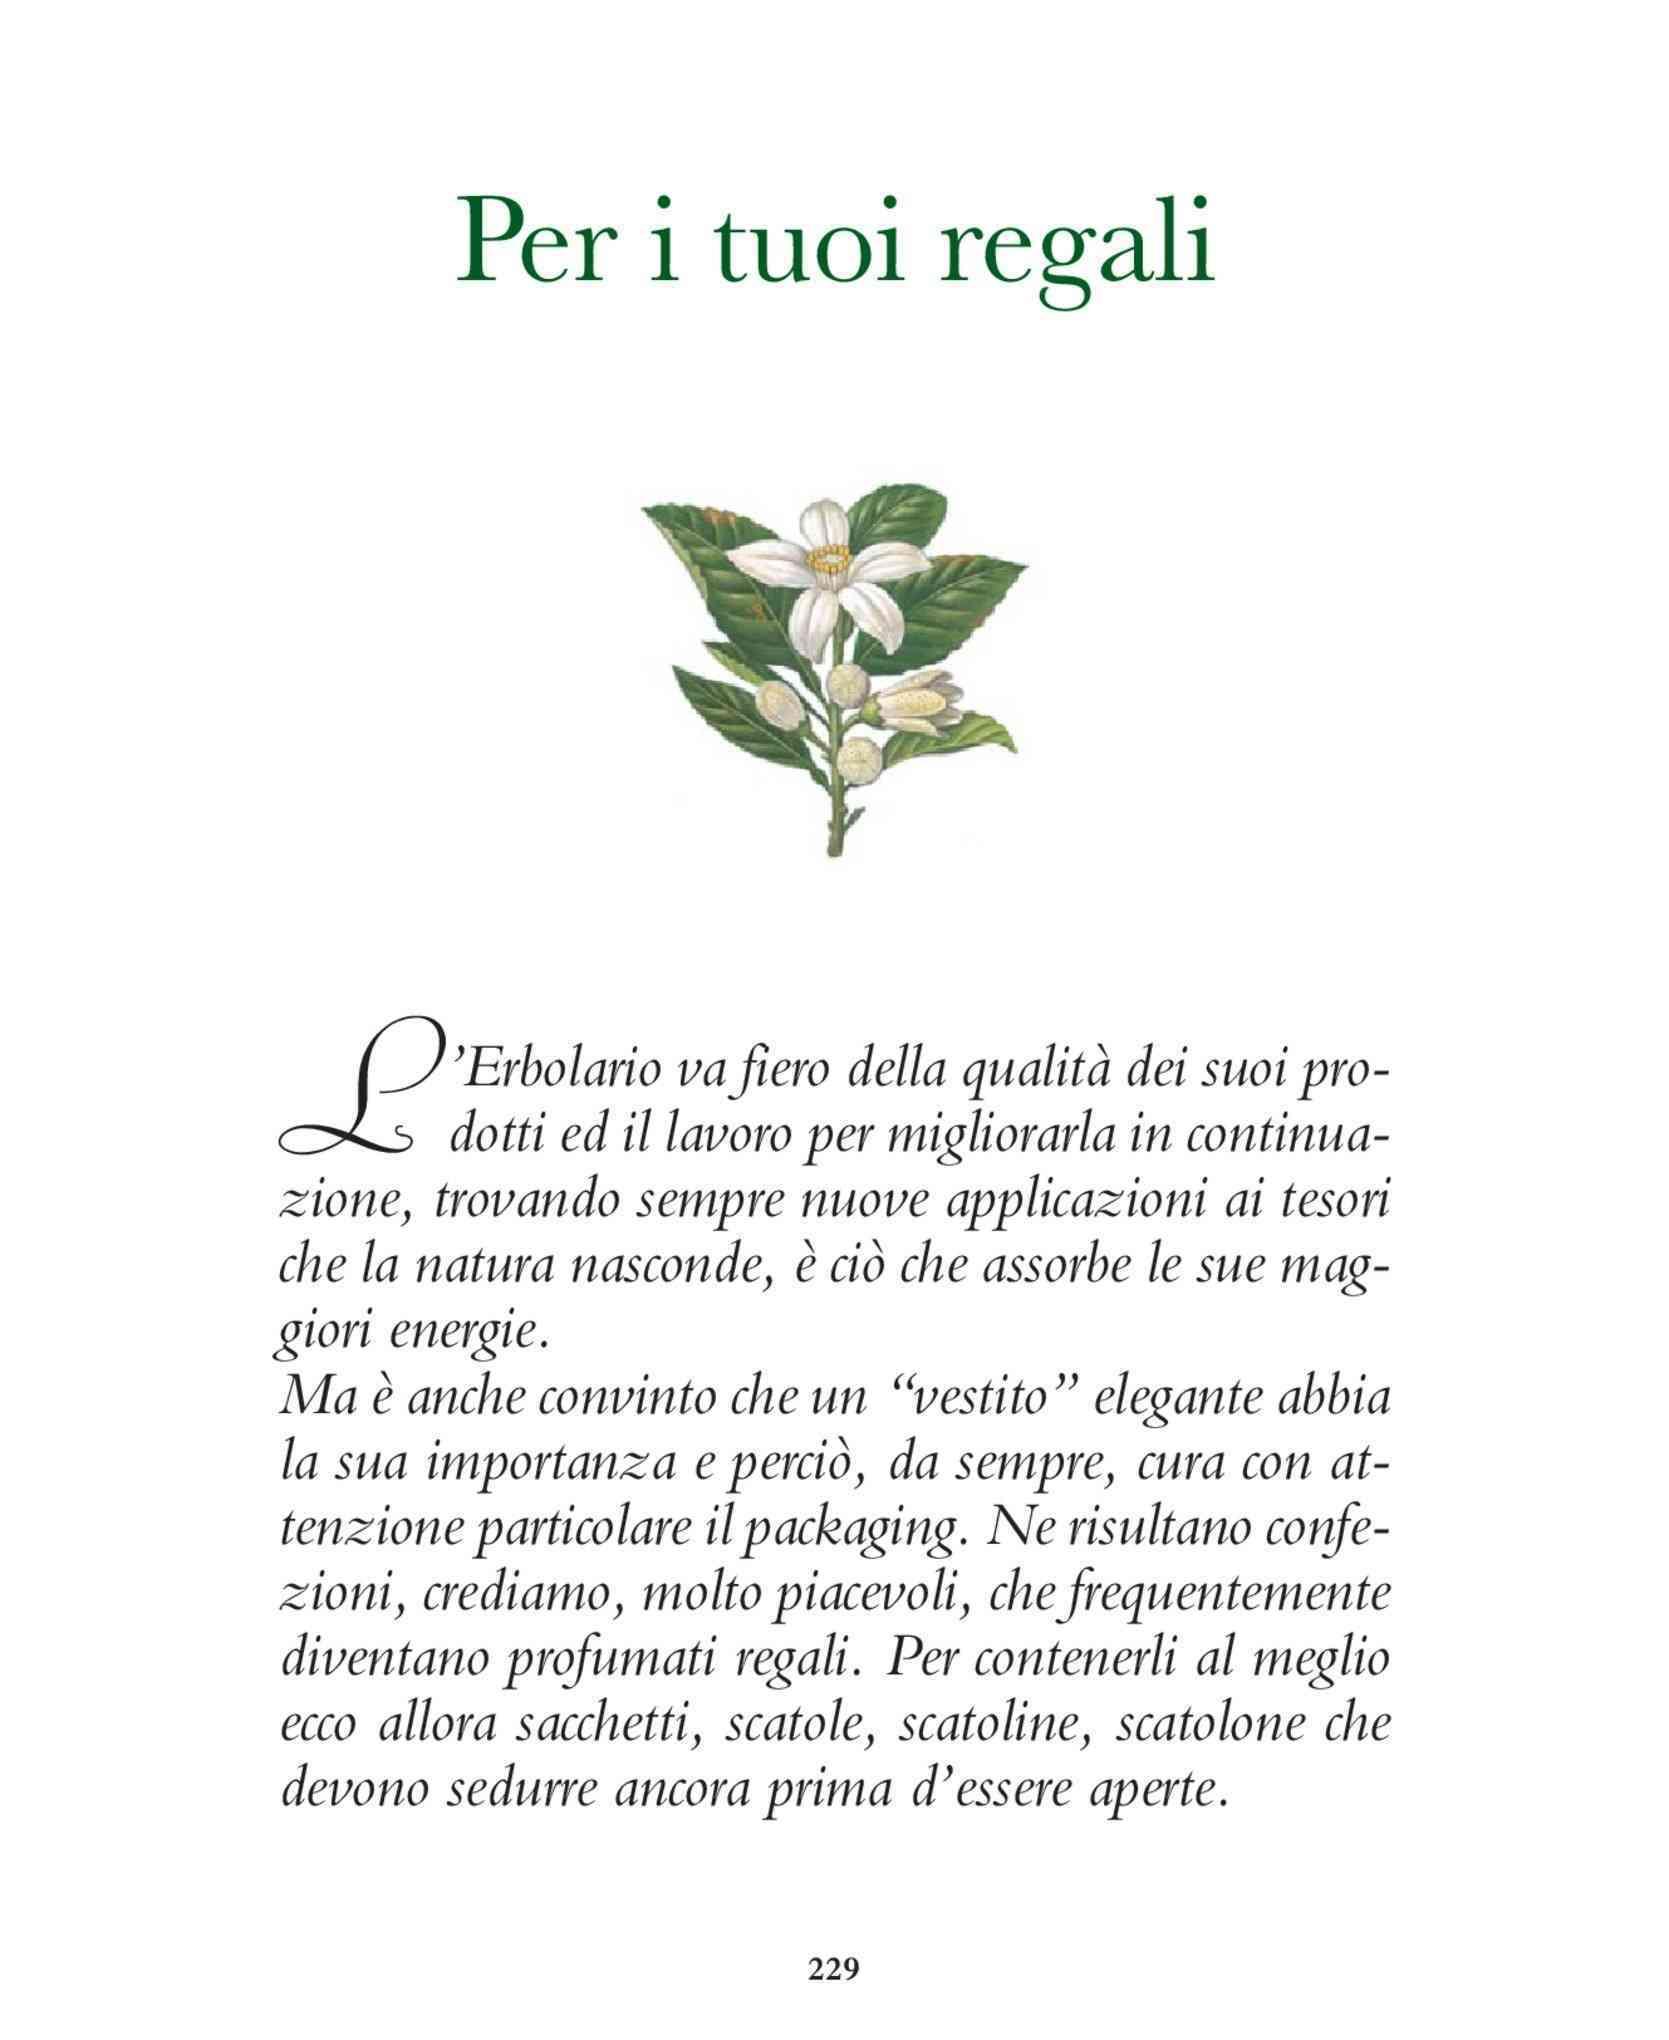 Vestiti Eleganti Negozi Torino.Offerte Vestiti Eleganti A Torino Shopping Nel Negozio Promoqui